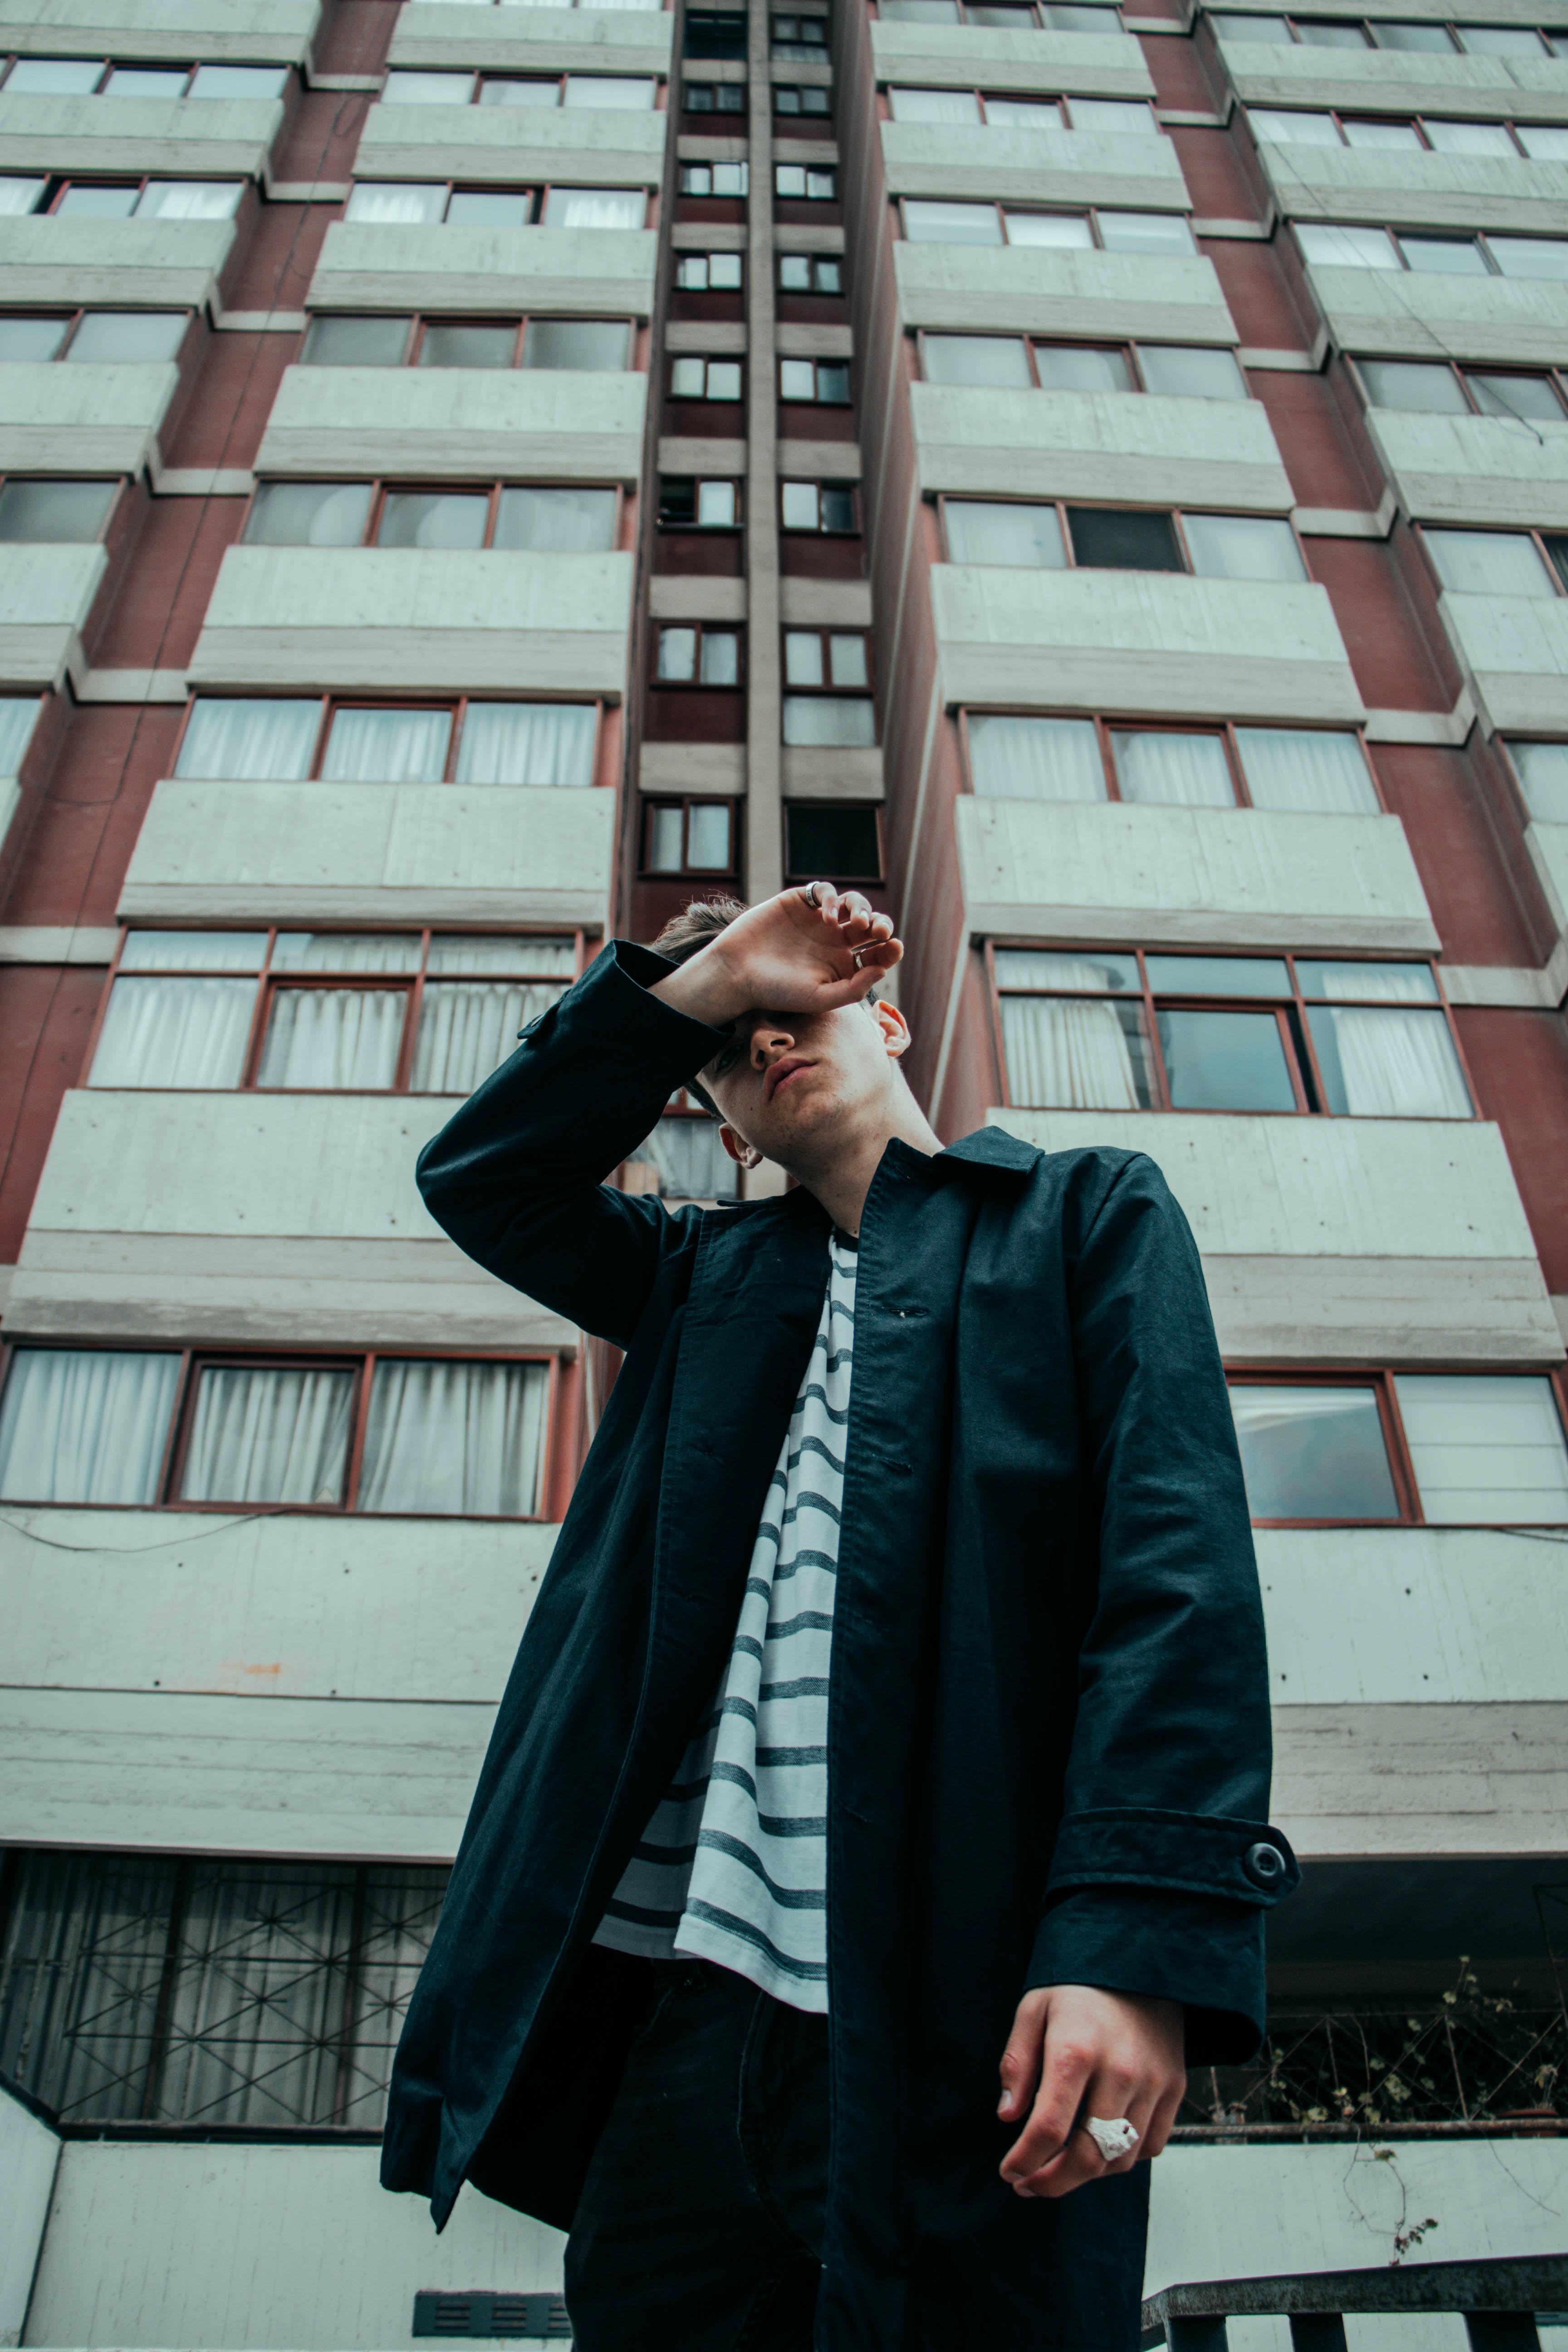 man wearing black jacket standing near building